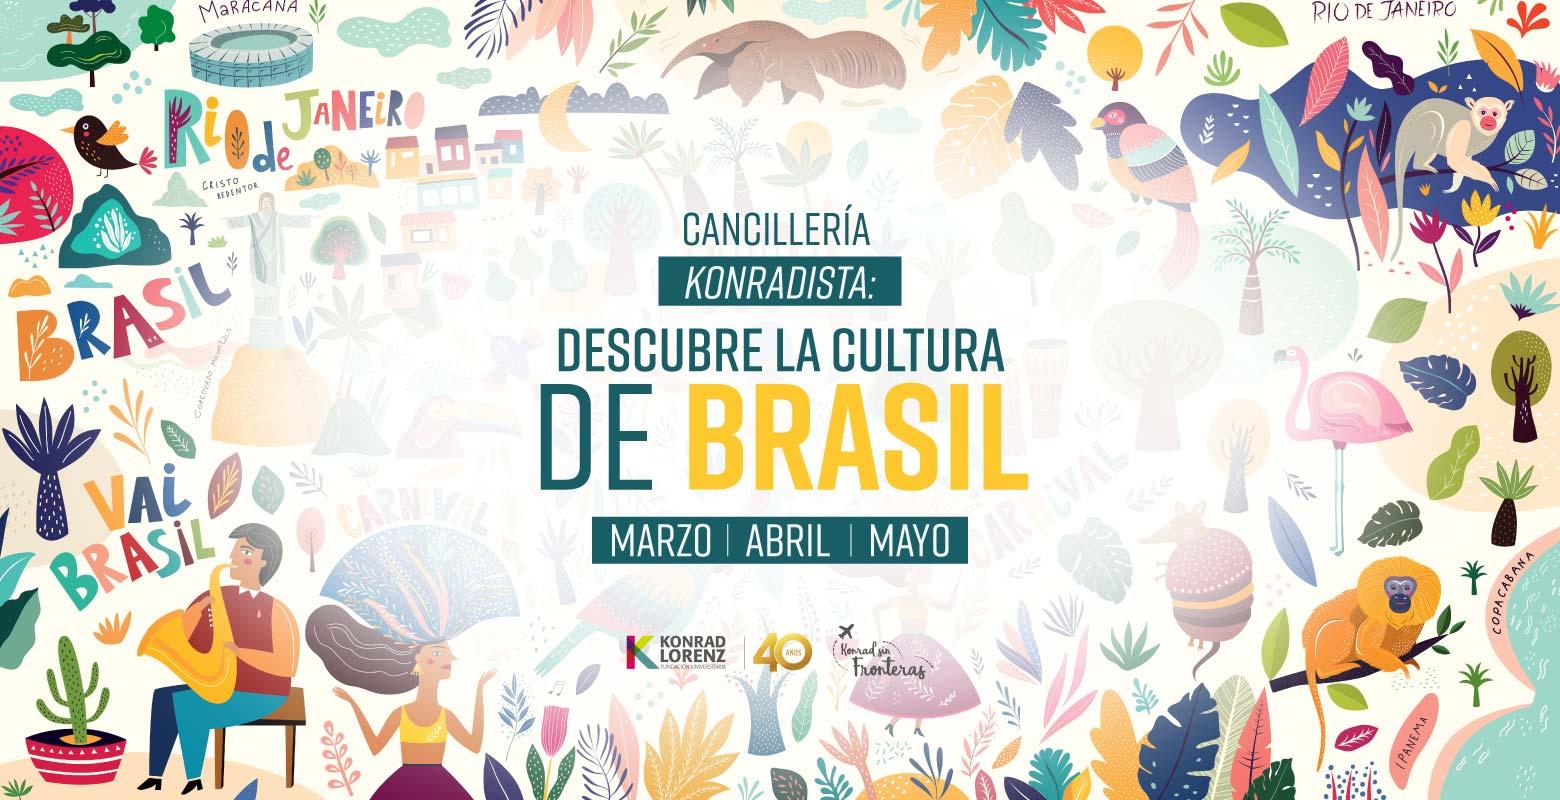 Konradista: Descubre la Cultura de Brasil